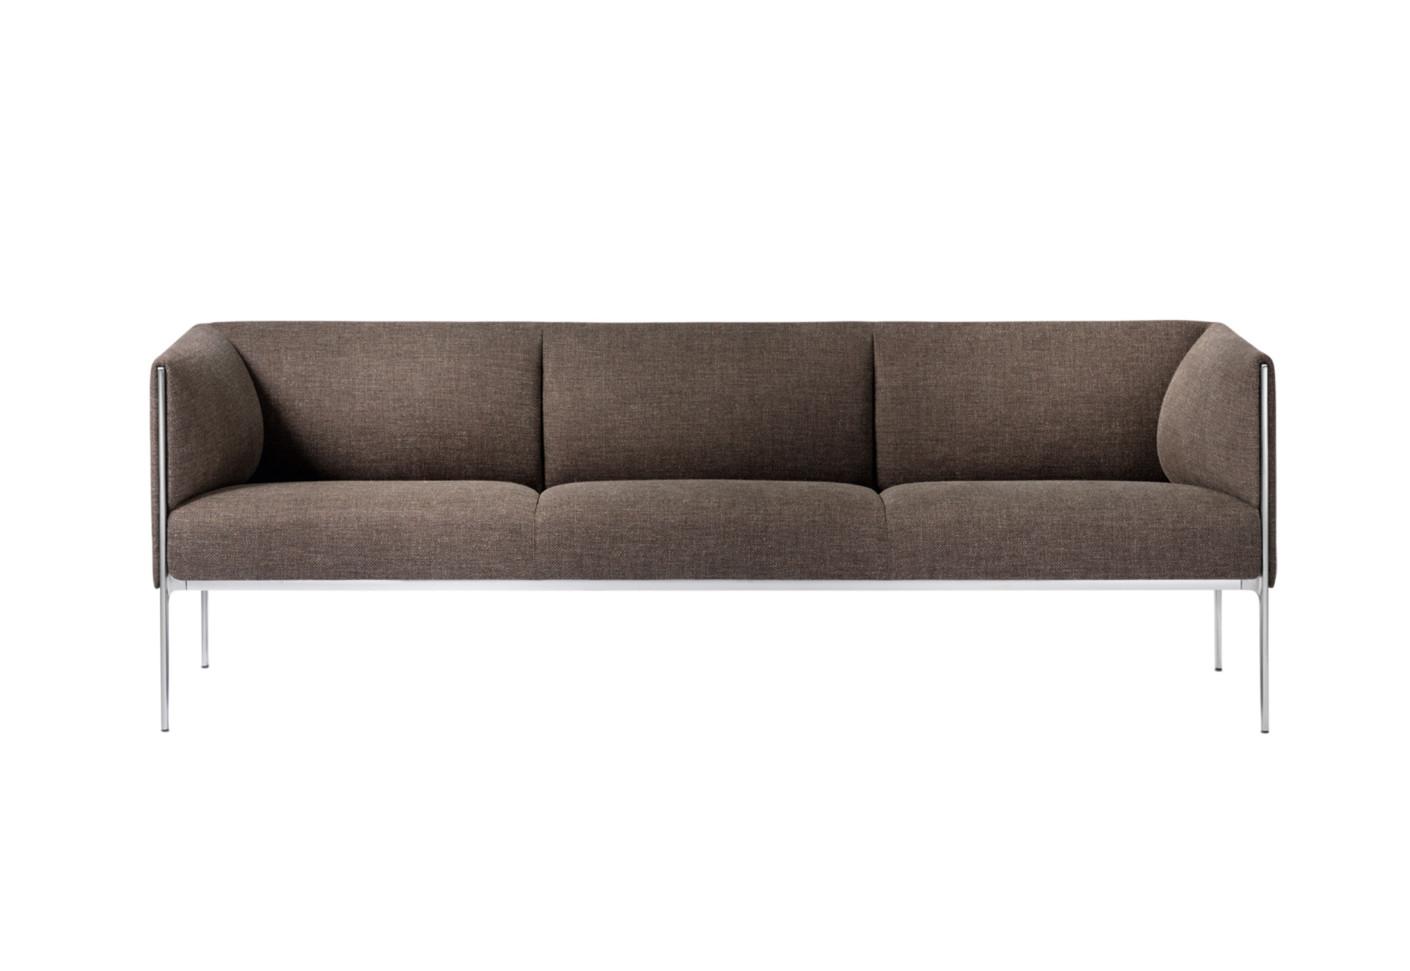 Asienta 3 Seater Sofa By Wilkhahn Stylepark